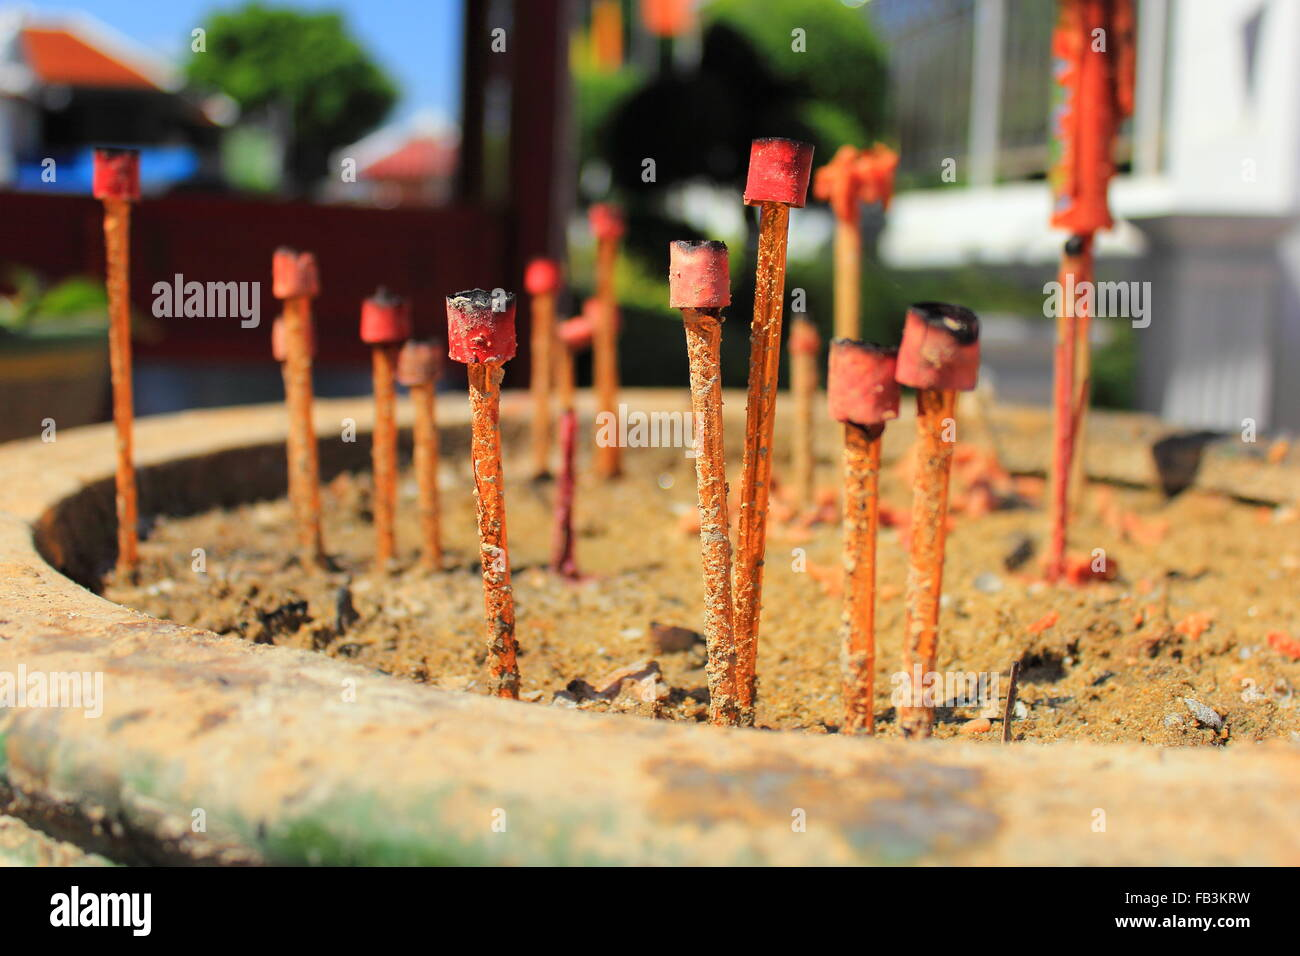 background of extinguish big incense sticks in joss stick pot - Stock Image